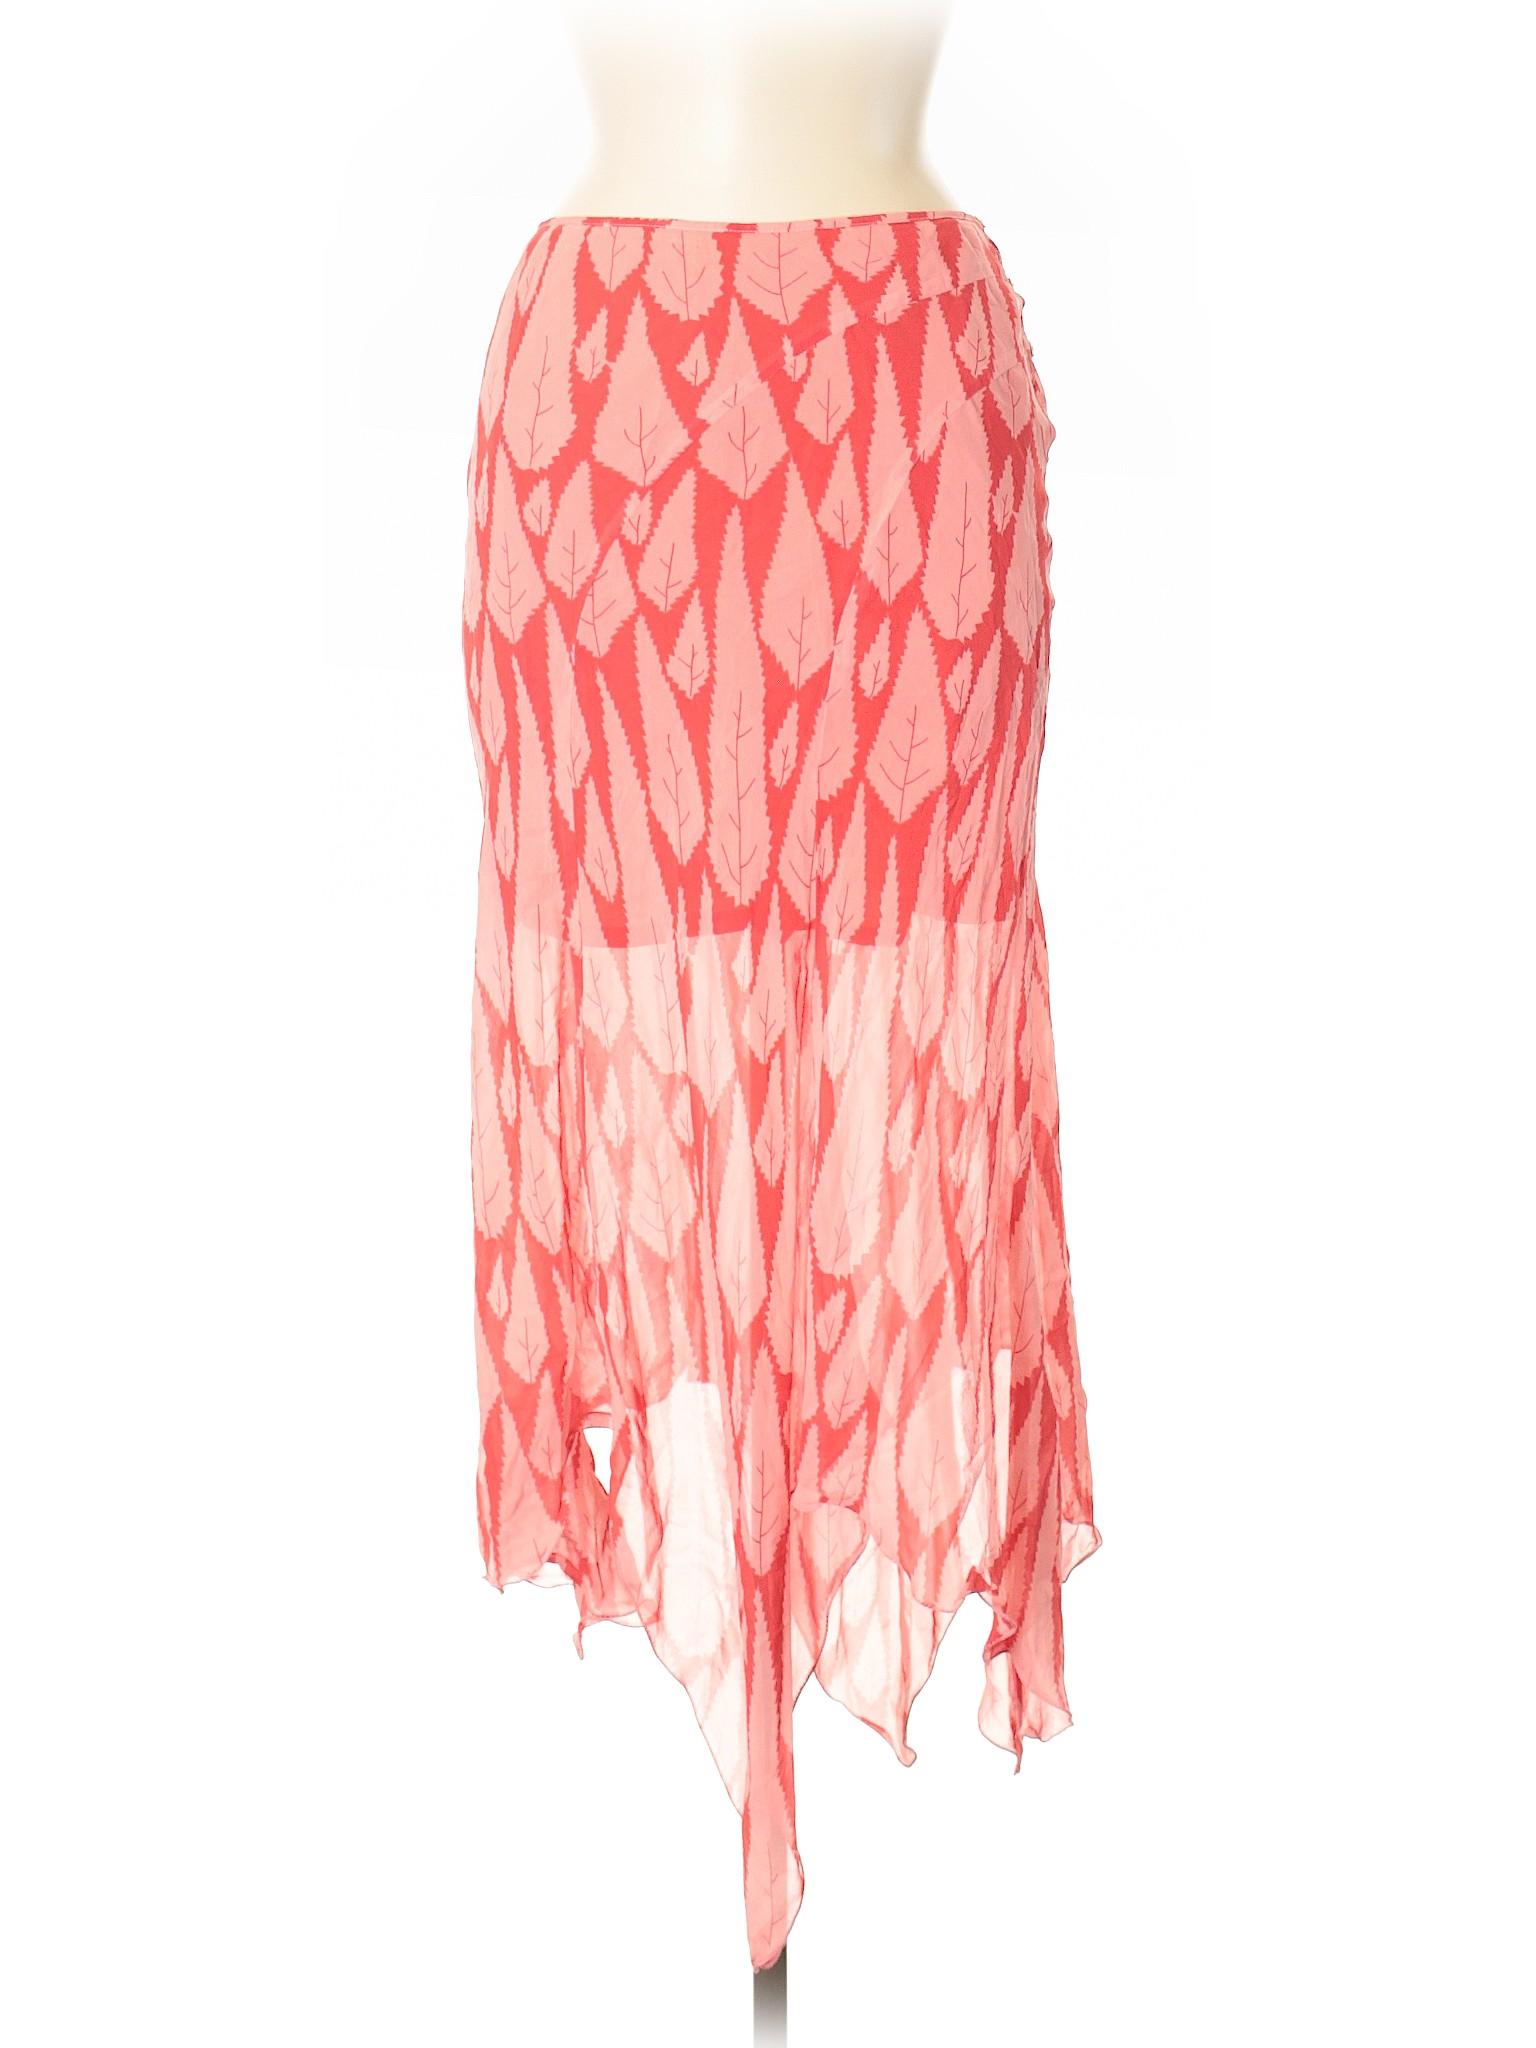 Boutique Boutique Skirt Silk Silk qwgI8wf